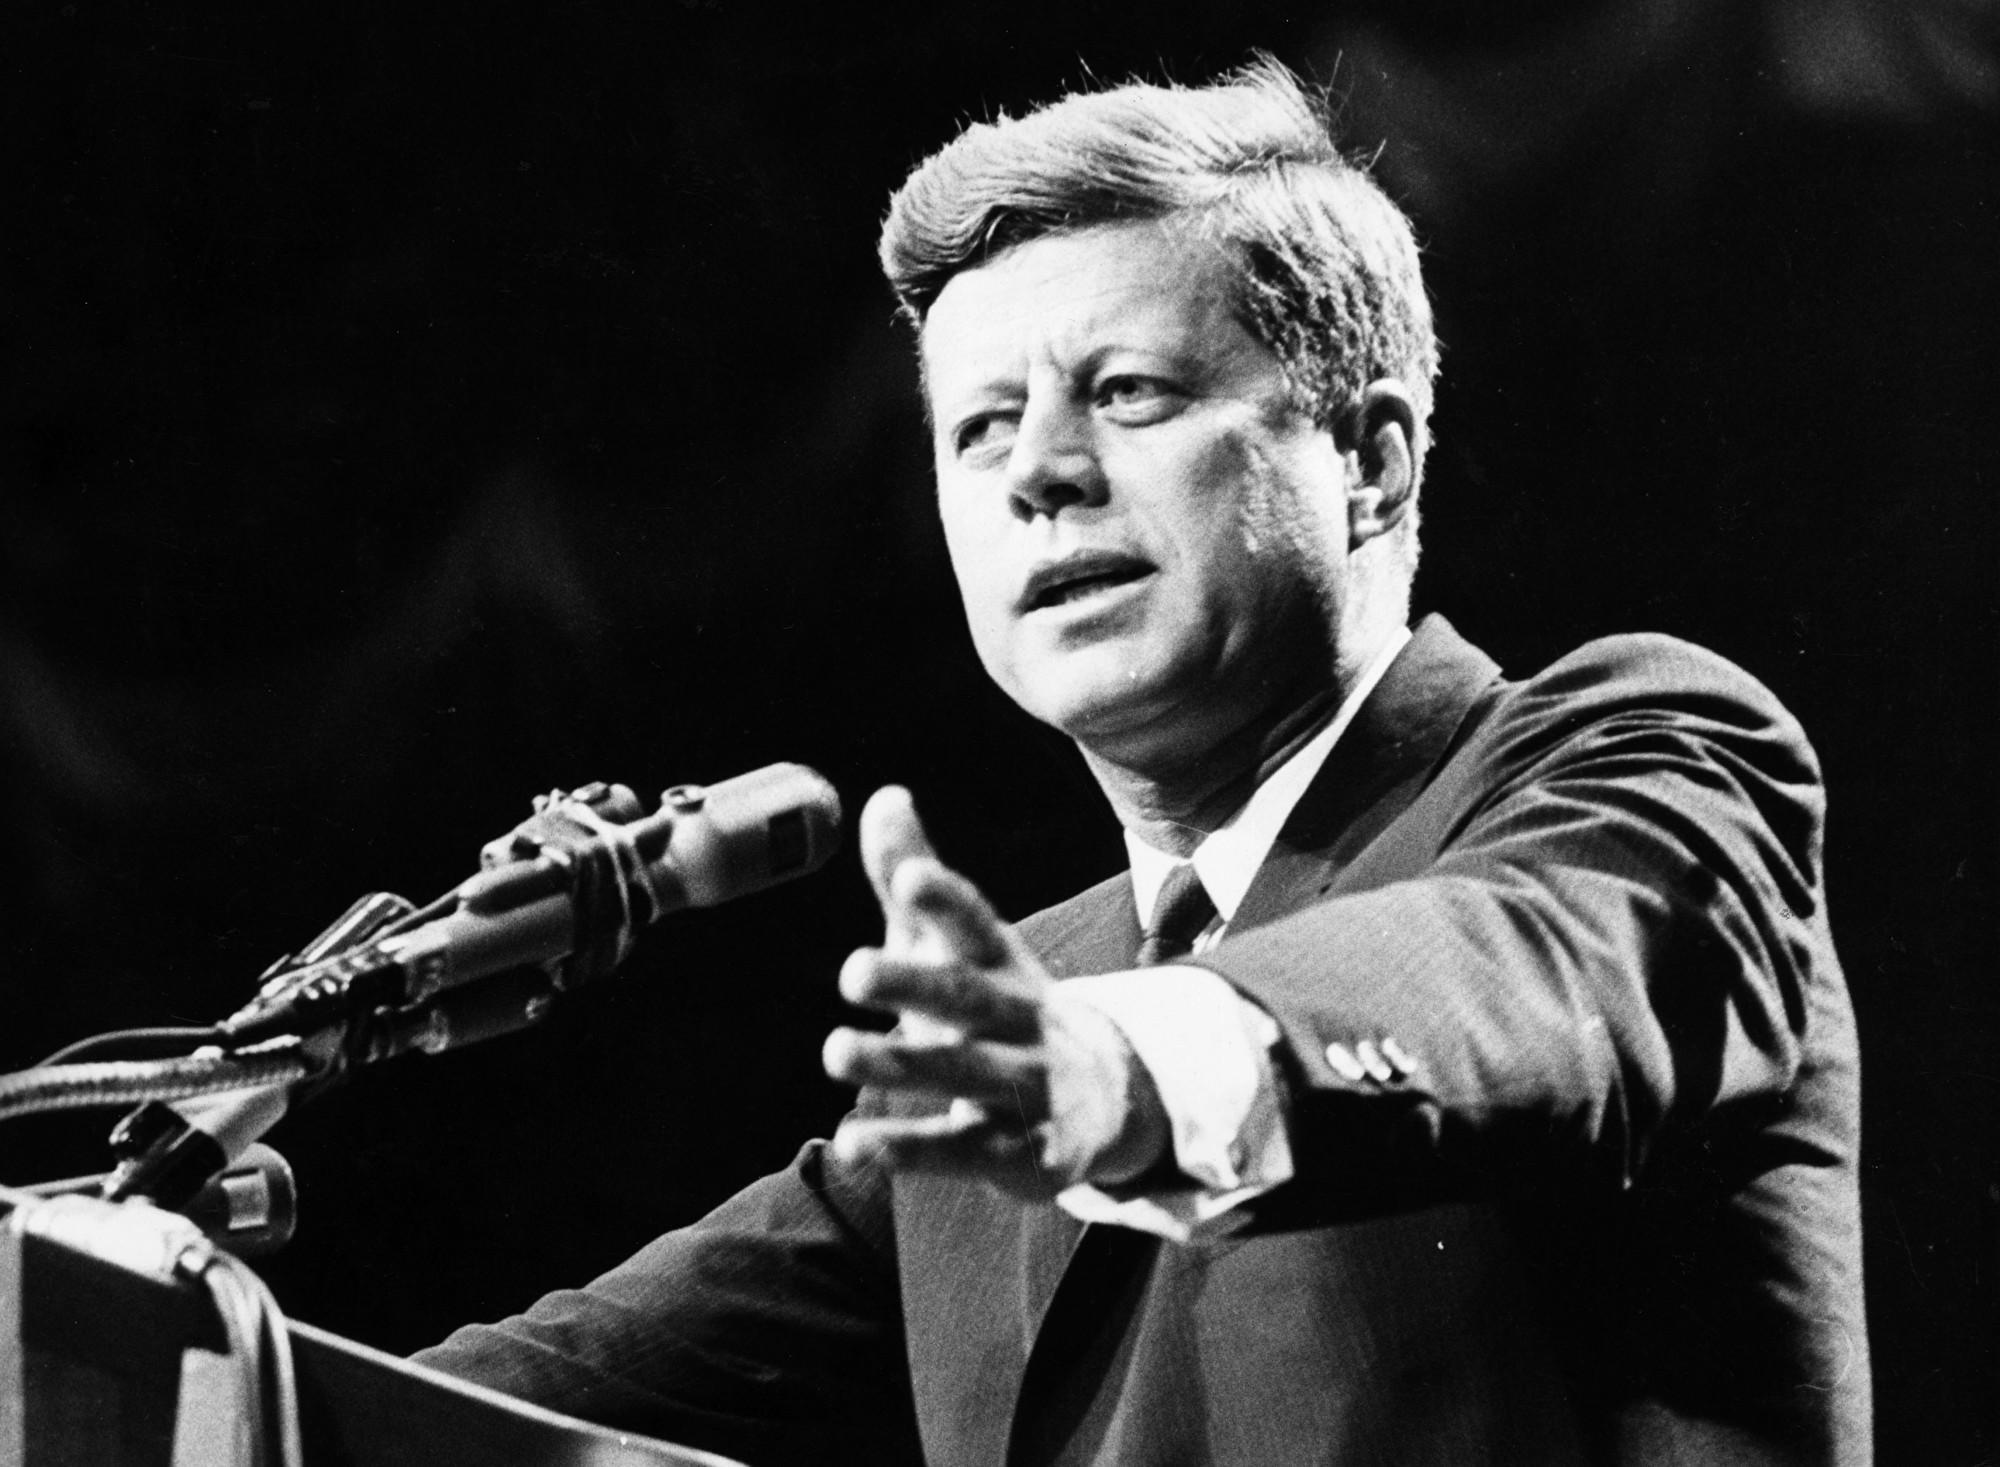 美國前總統甘迺迪攝於1962年。(Central Press/Getty Images)